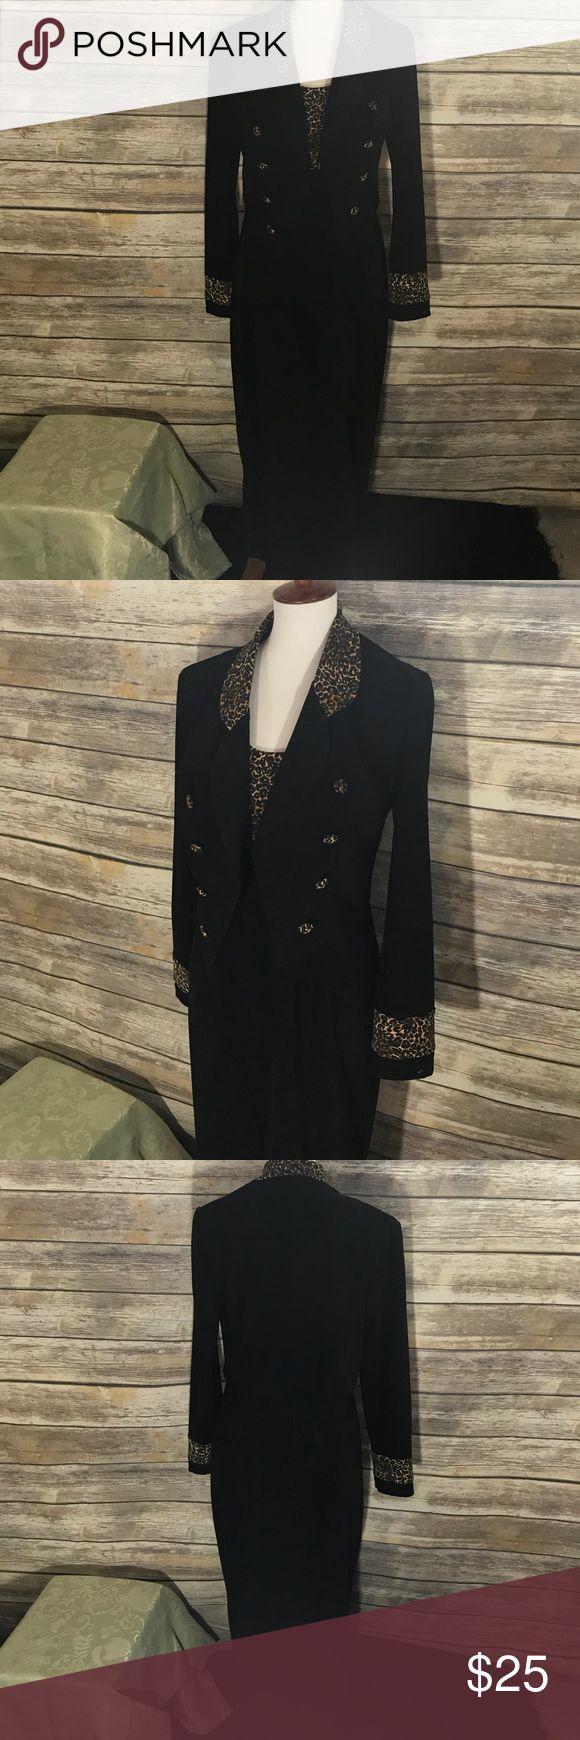 Dress Sheri Martin black suede and animal print long dress with jacket. 97% polyester 3% Spandex Sheri Martin Dresses Maxi